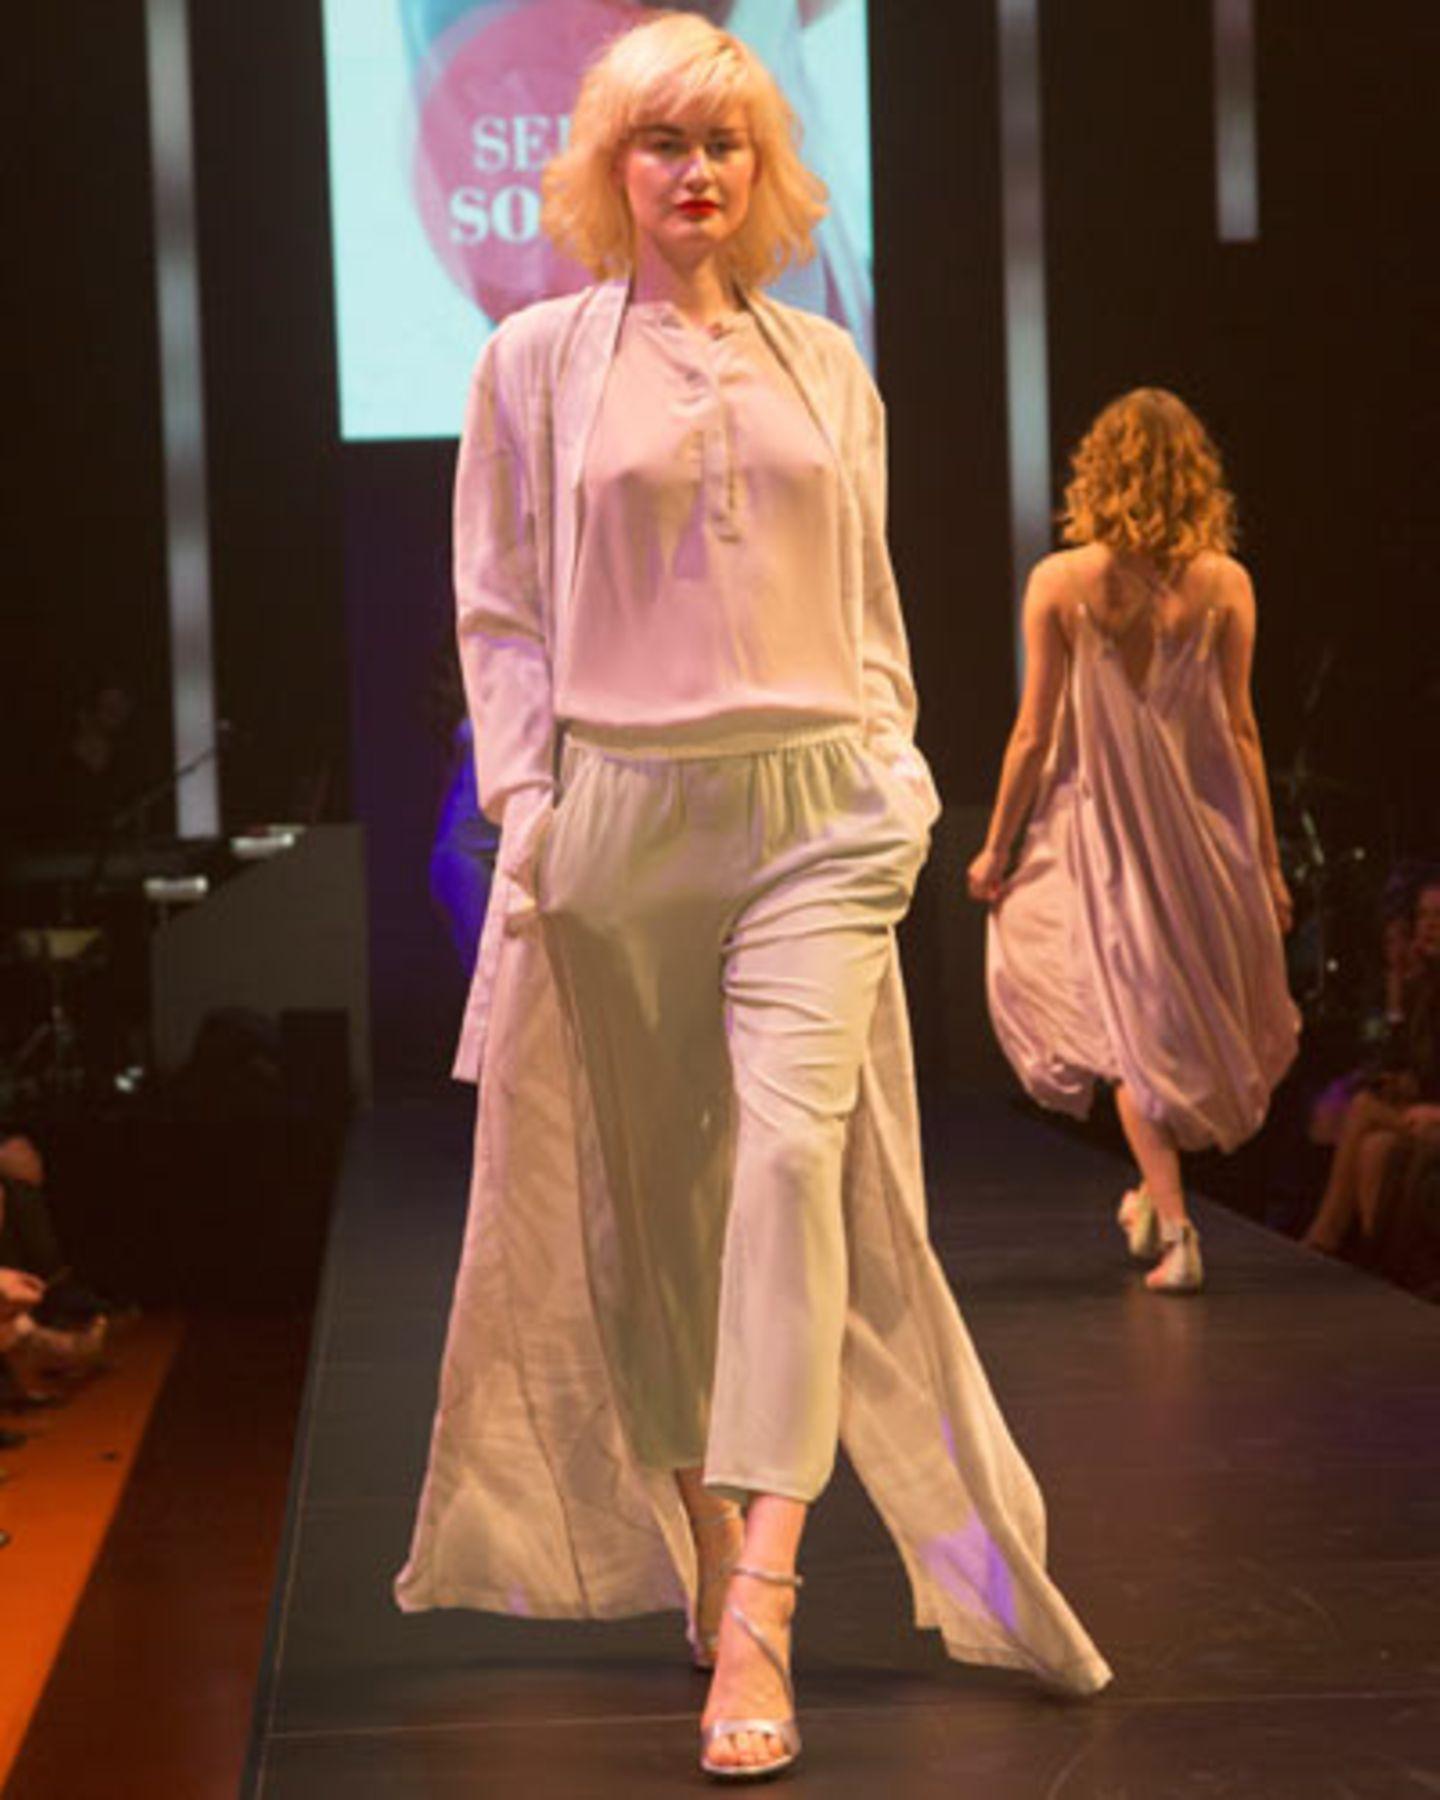 Edle Seidenhose von Escada, halbtransparente Bluse von Mexx. Mantel: Malaika Raiss. Schuhe: Stuart Weitzman.